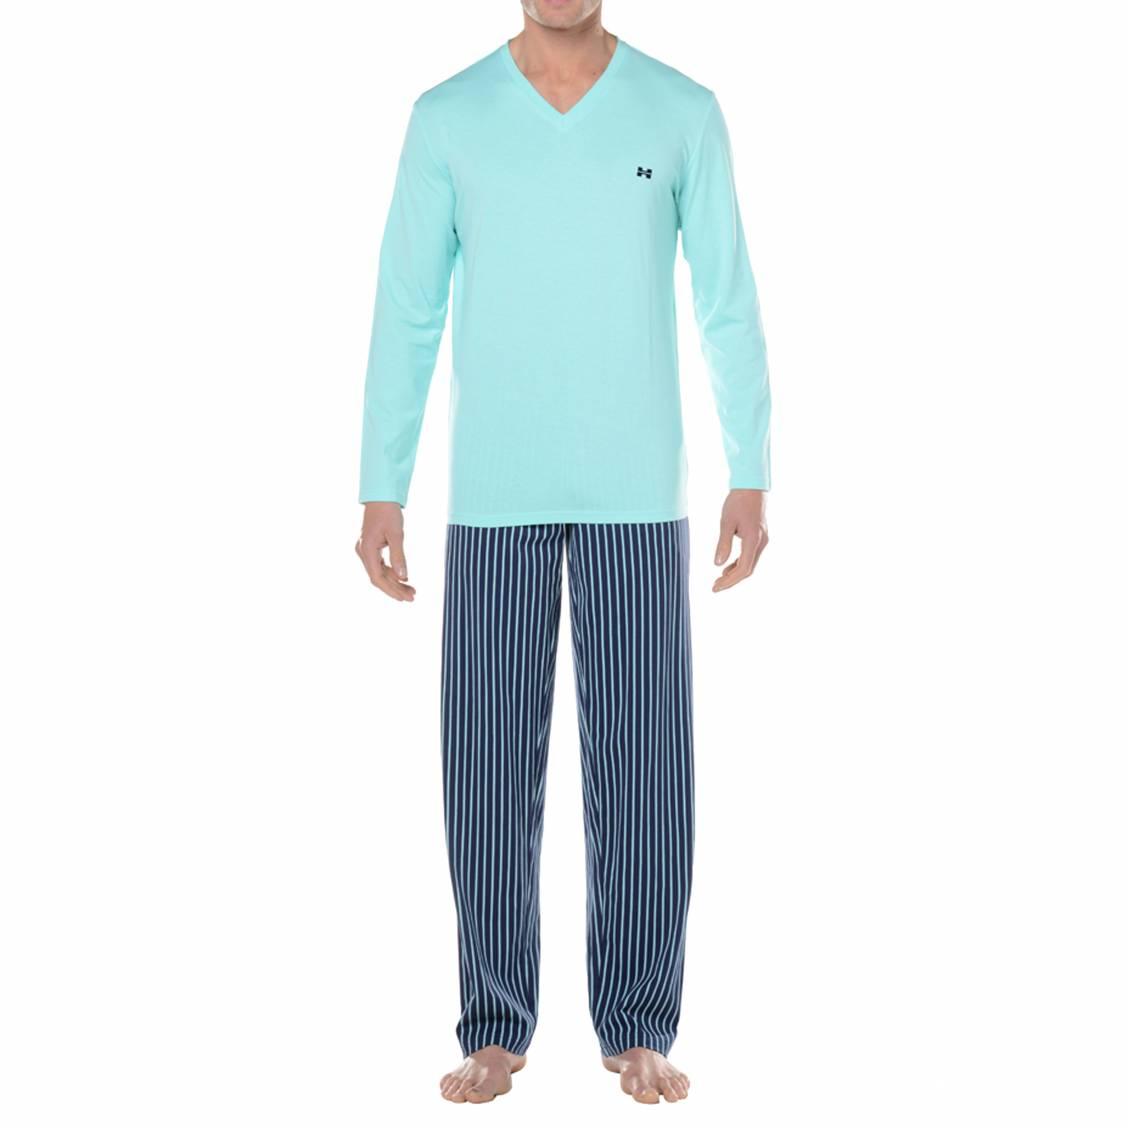 pyjama chaud vente en ligne de pyjamas d 39 hiver homme rue des hommes. Black Bedroom Furniture Sets. Home Design Ideas